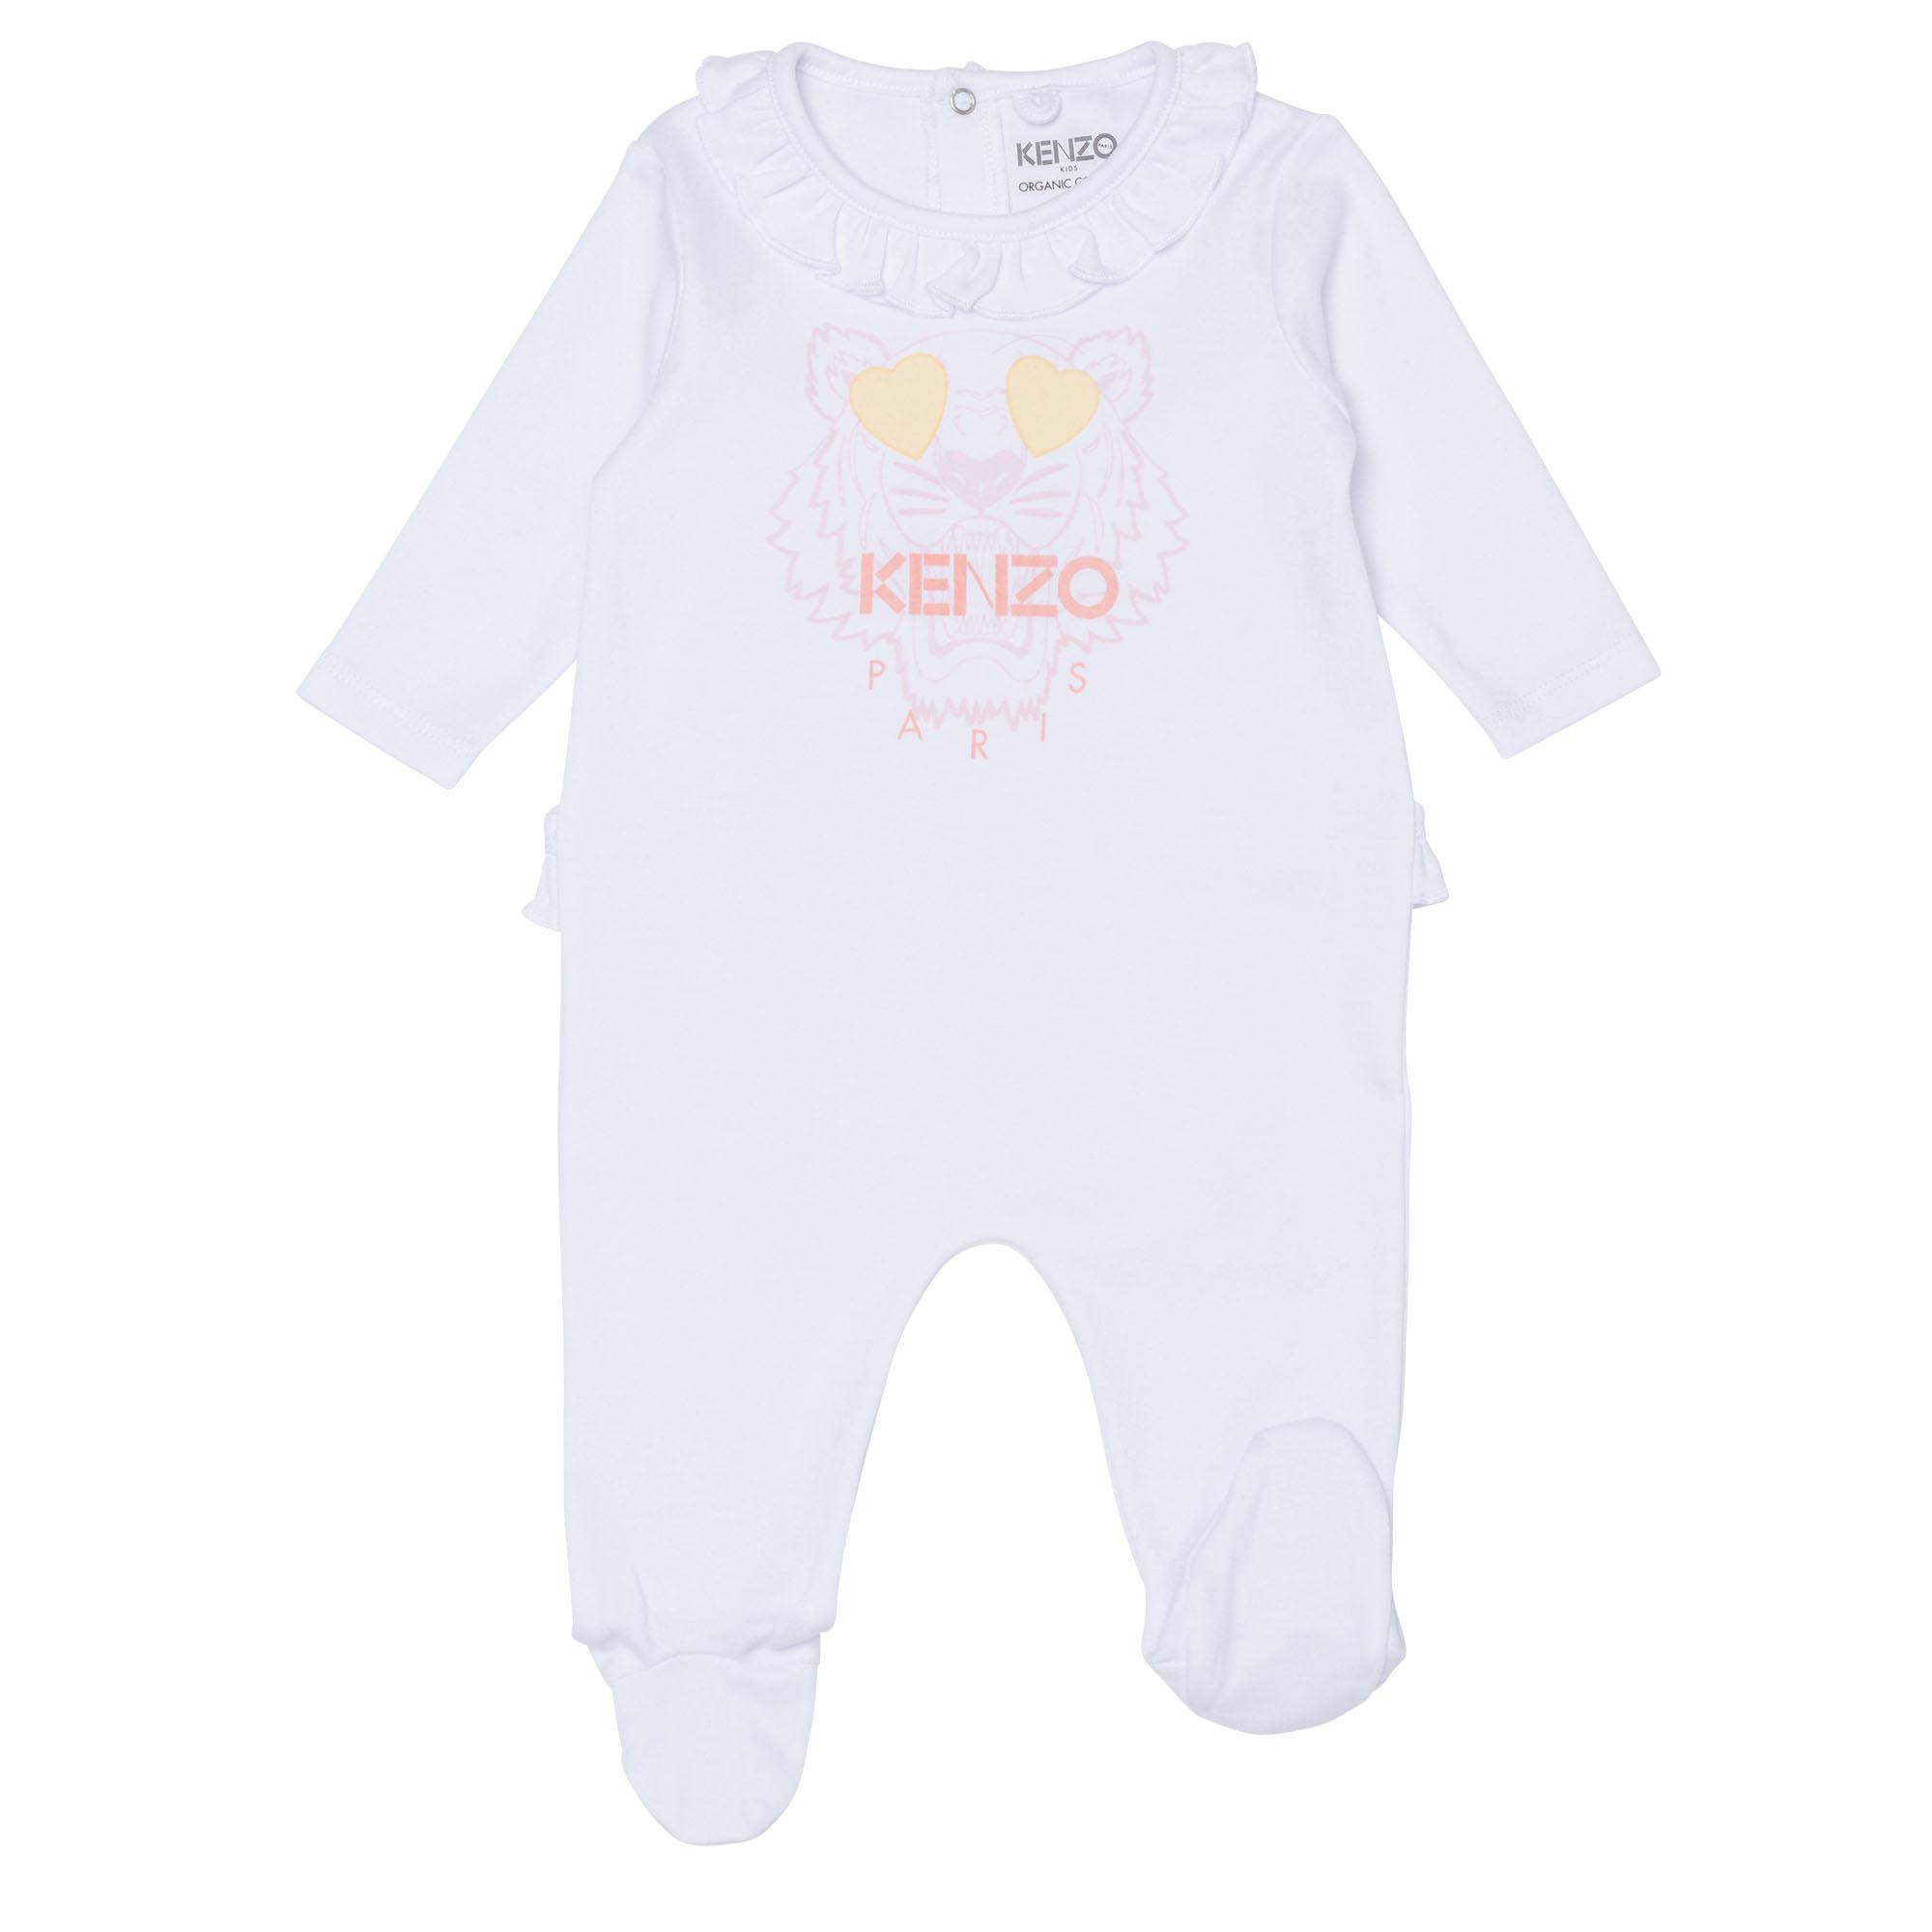 Pyjama en coton biologique KENZO KIDS BEBE COUCHE FILLE